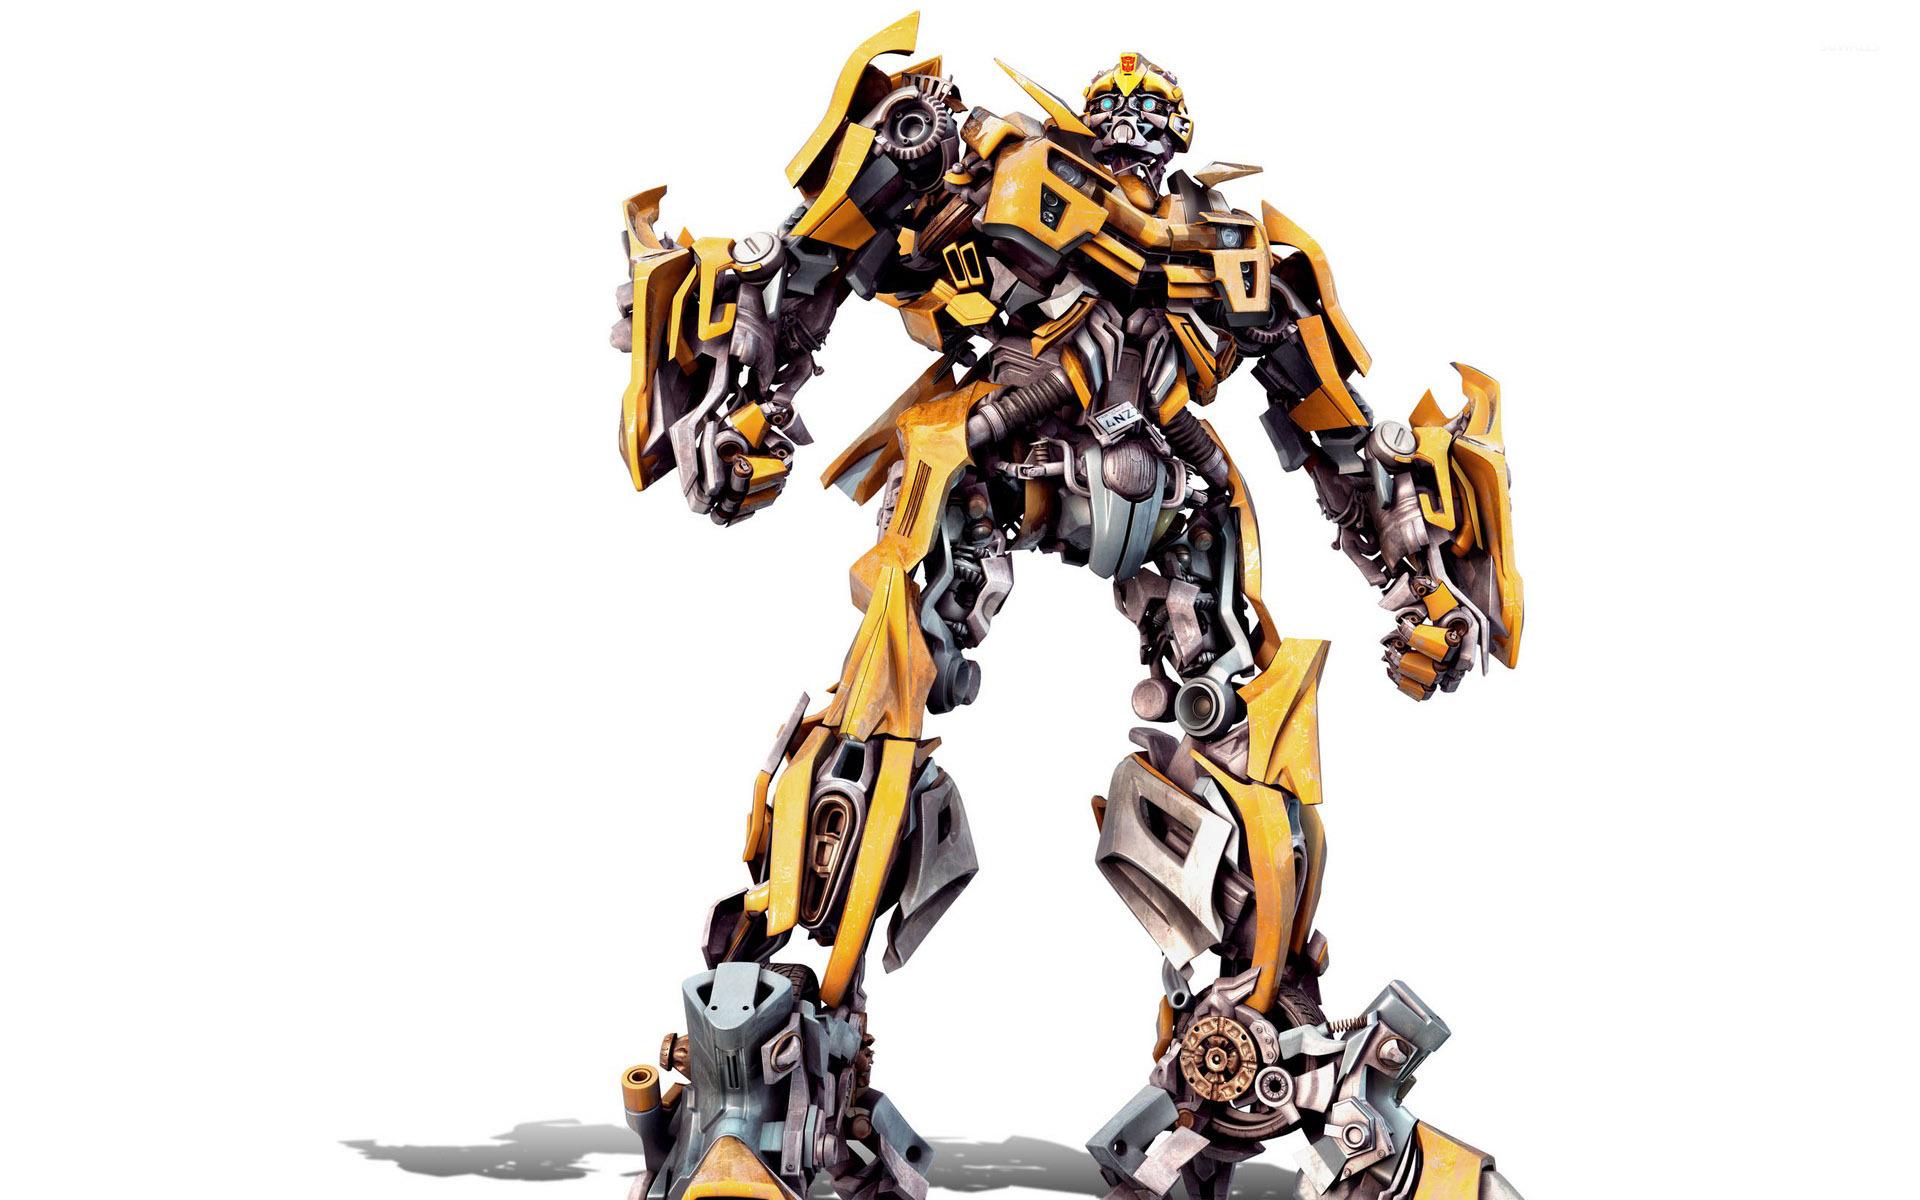 Transformers 2 Bumblebee Wallpaper Transformers 2 Movies ...